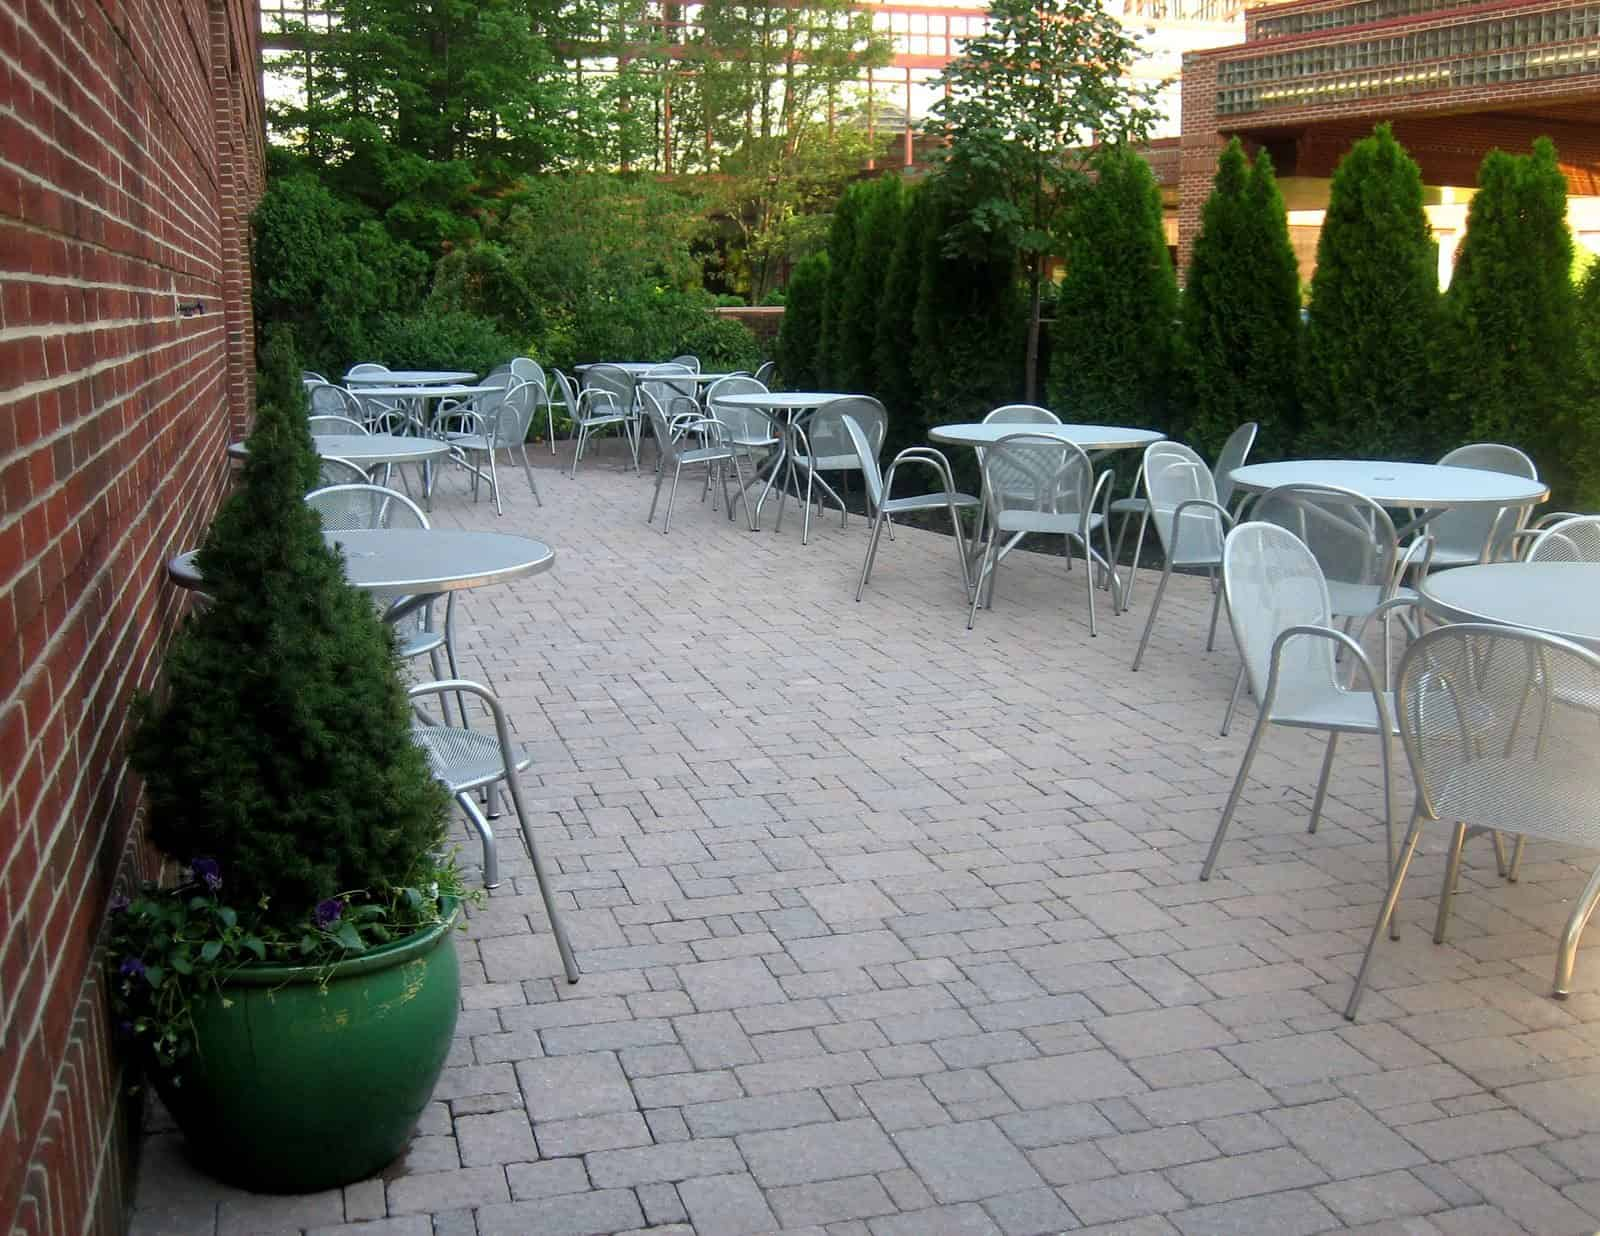 Paver Patio - Techo Bloc Paver Patio - Hera - Champlain Grey - Random Pattern - Crown Plaza Hotel, Long Island NY